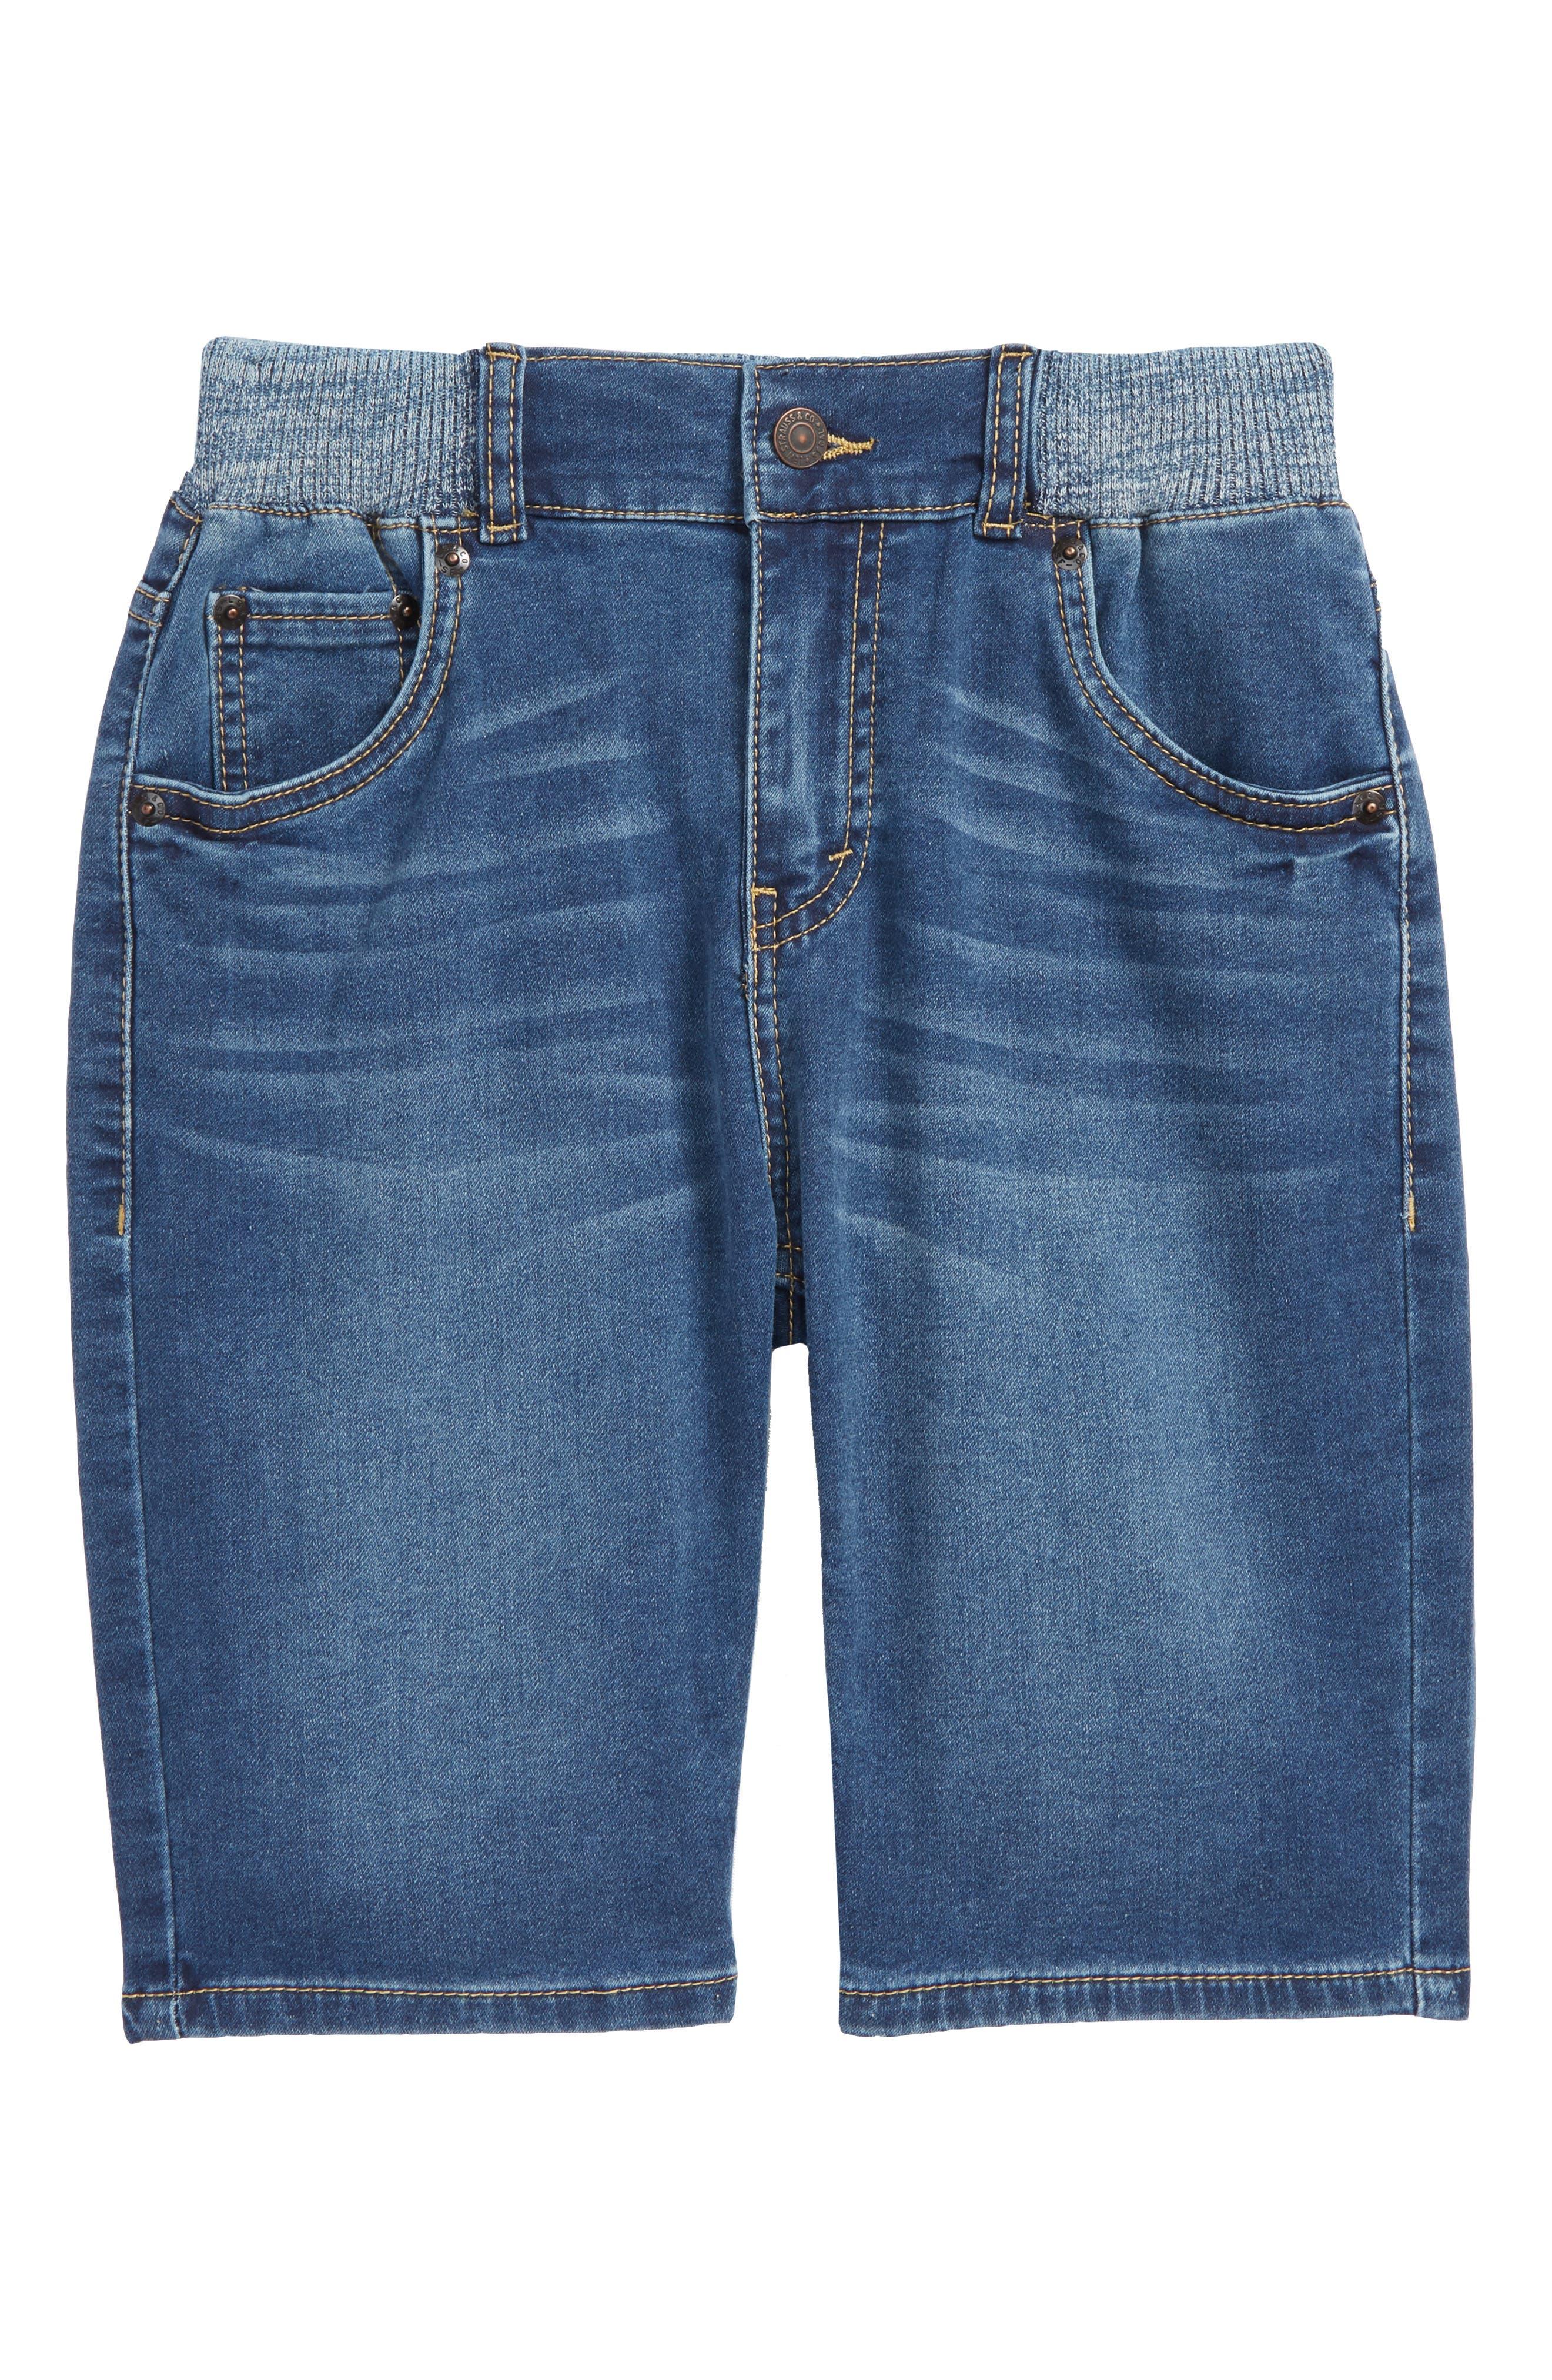 Levi's Super Chill Denim Shorts (Big Boys)